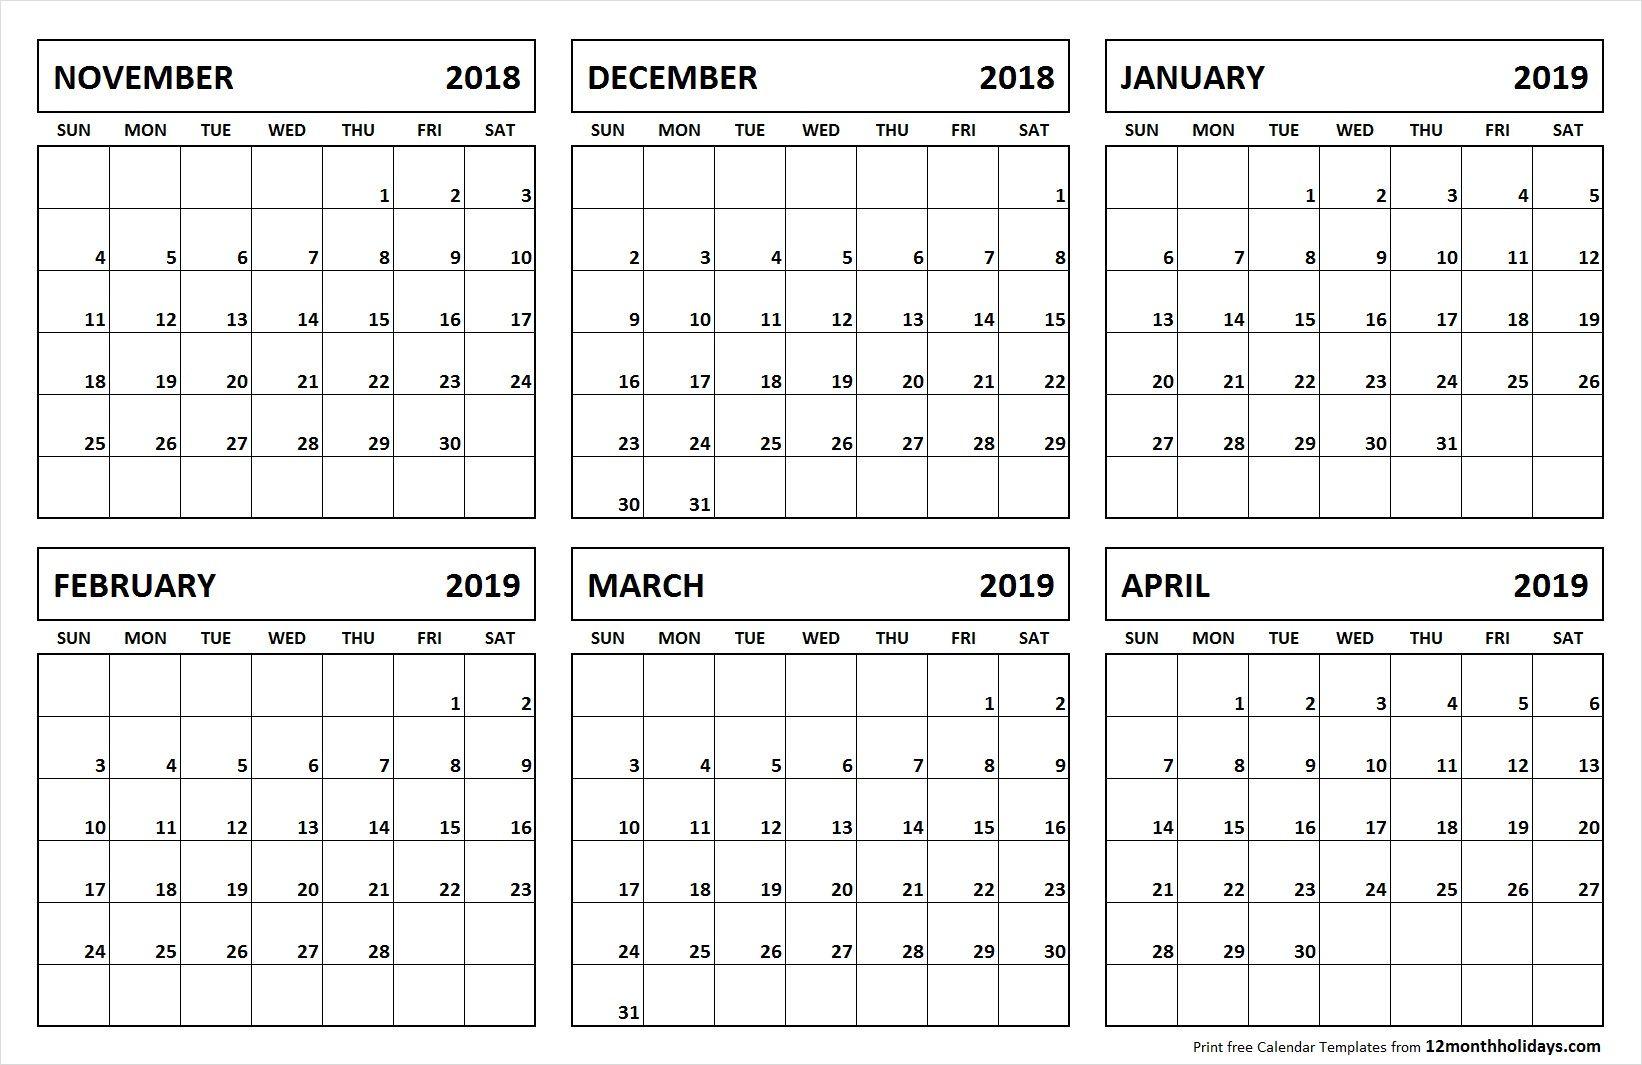 6 Month Calendar November 2018 April 2019